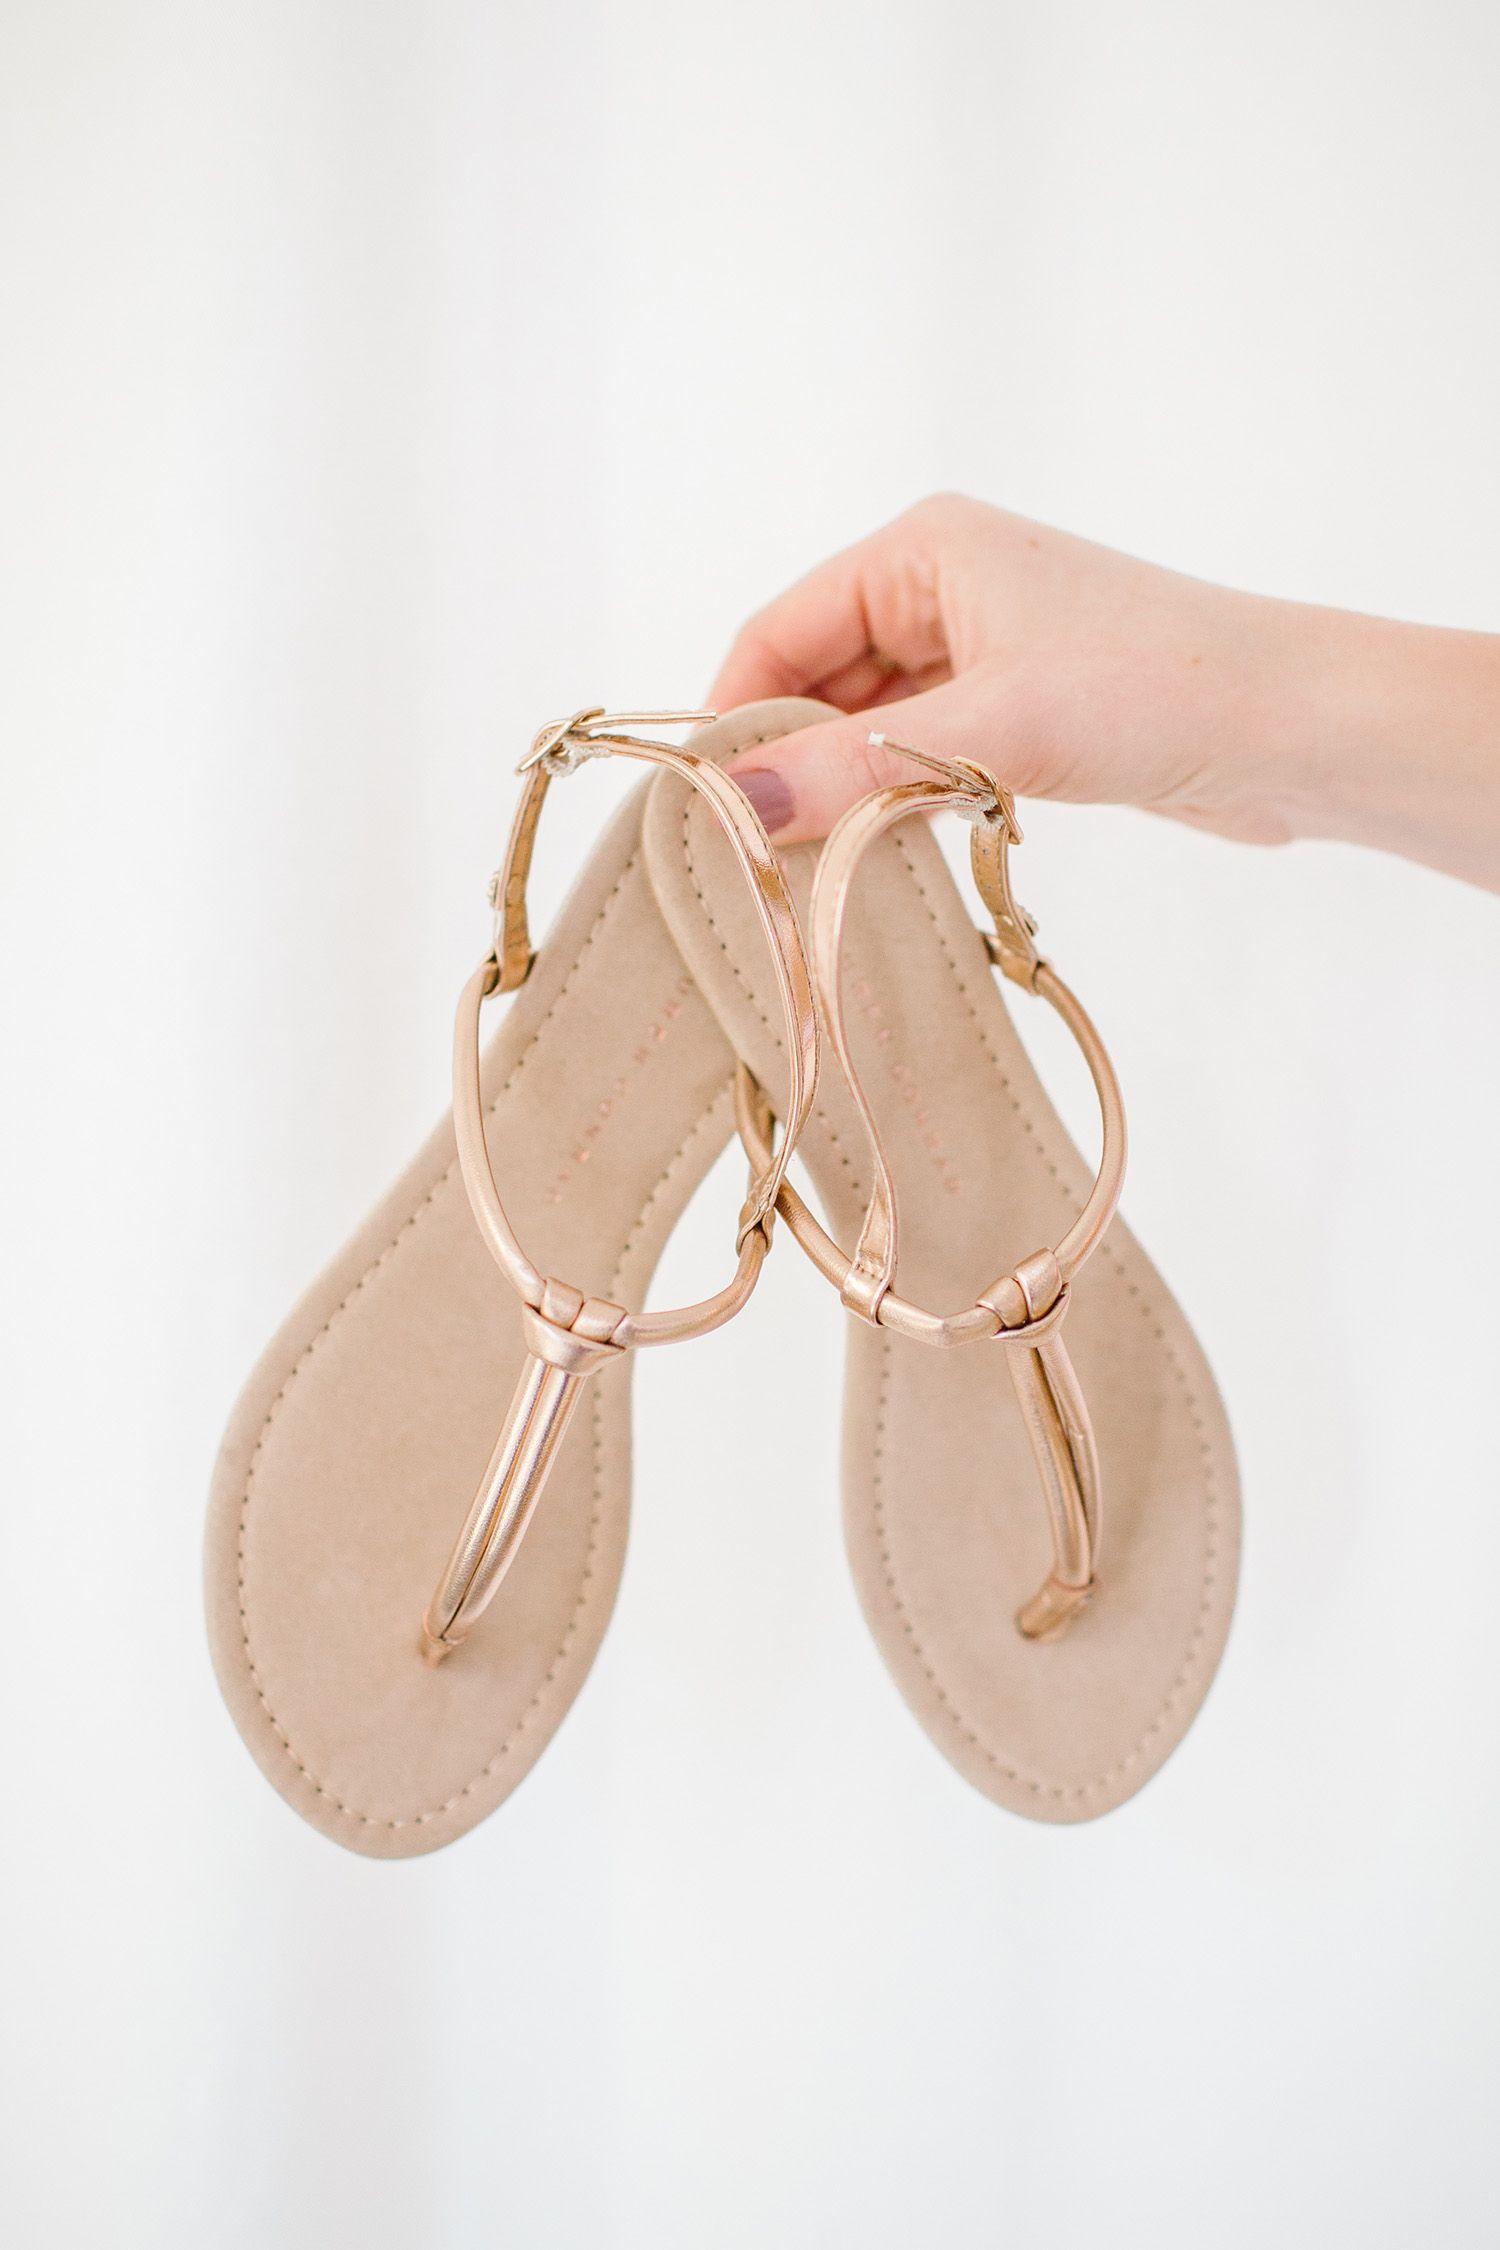 1c3cada29696 Women s LC Lauren Conrad Basic Knotted T-Strap Sandals